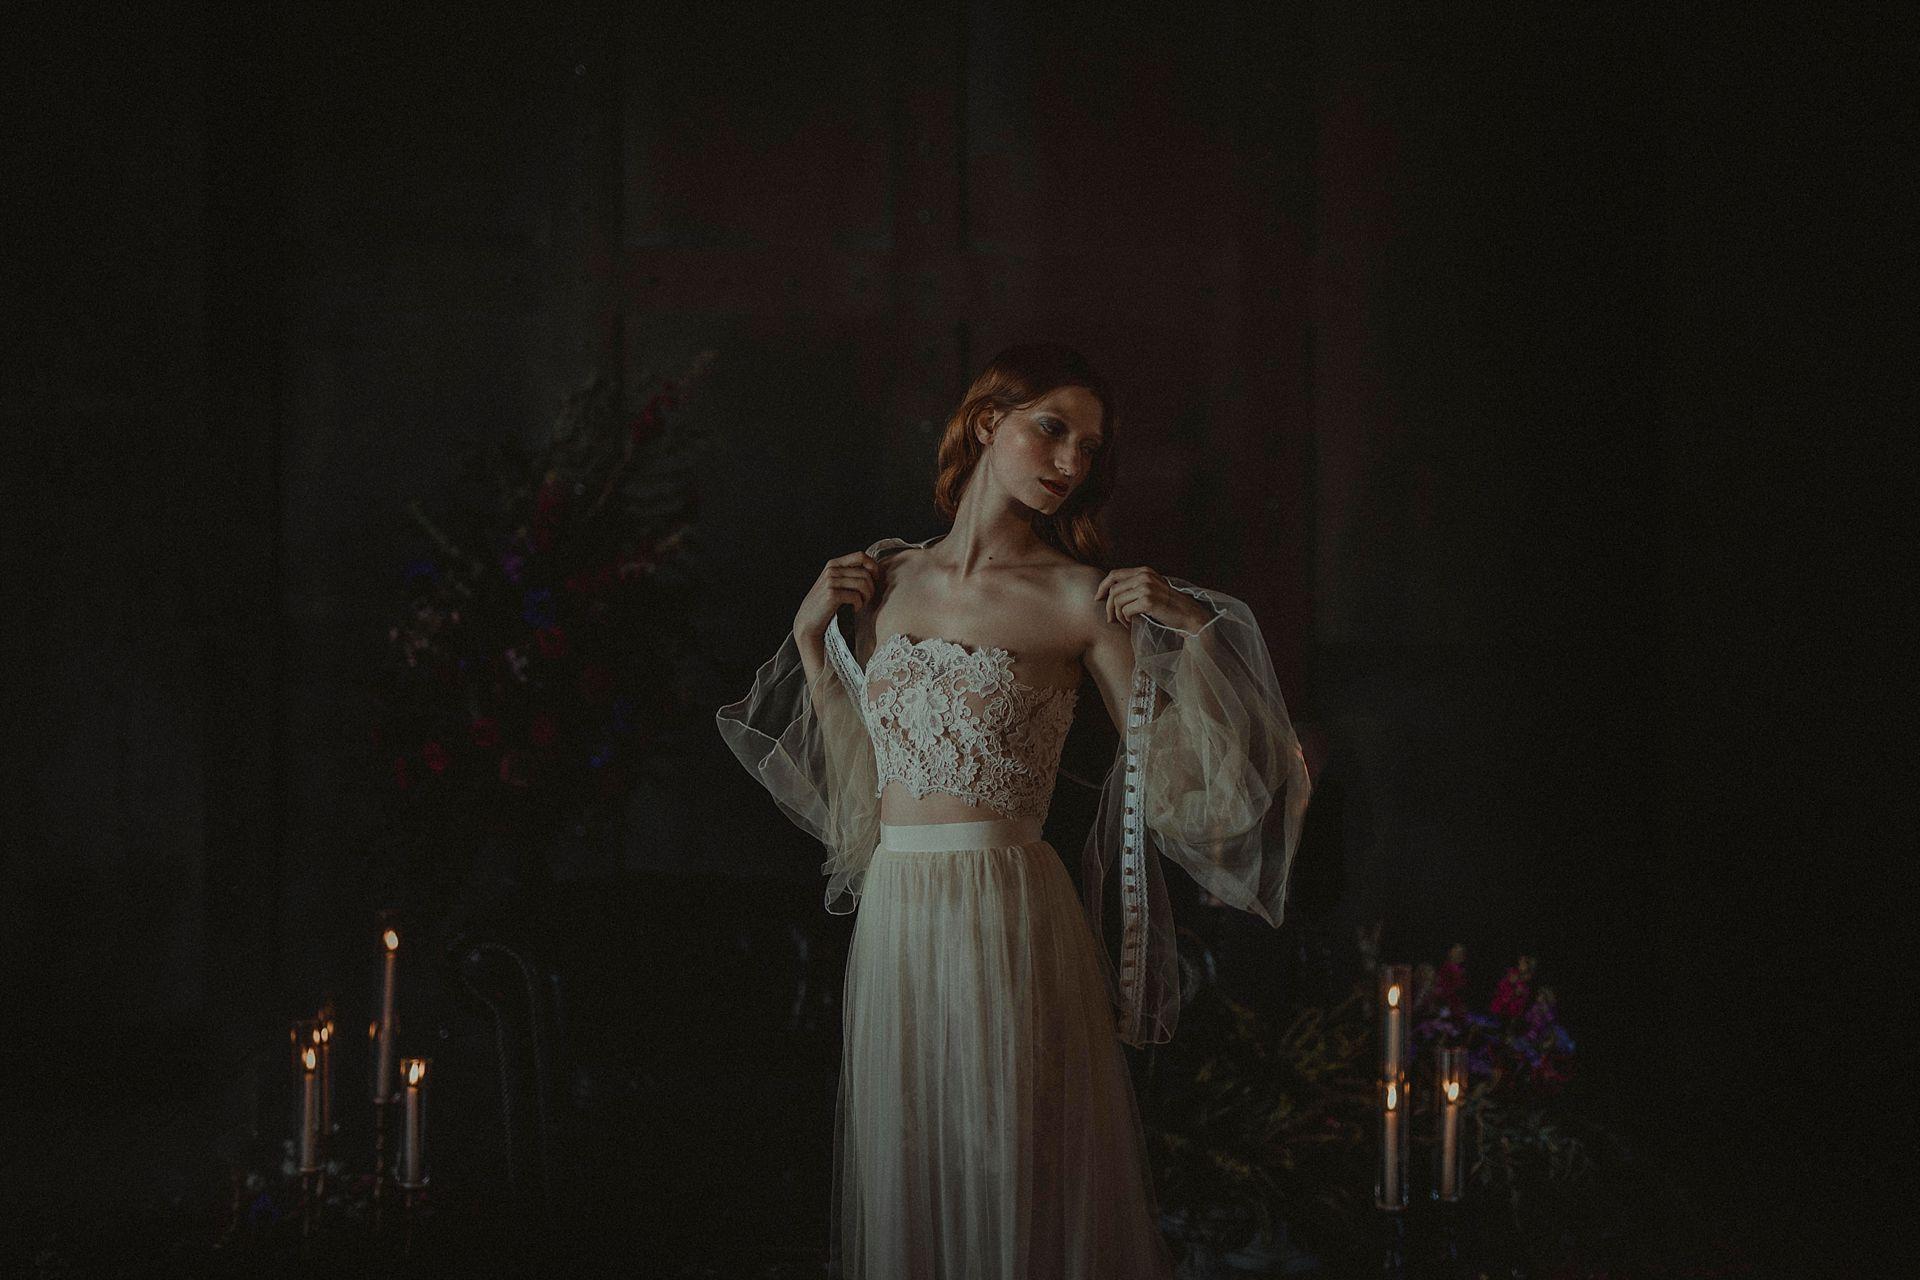 Decadent Wedding Inspiration- Moody Wedding Inspiration- Sudio Fotografico Bacci- Unconventional Wedding- bride dressing